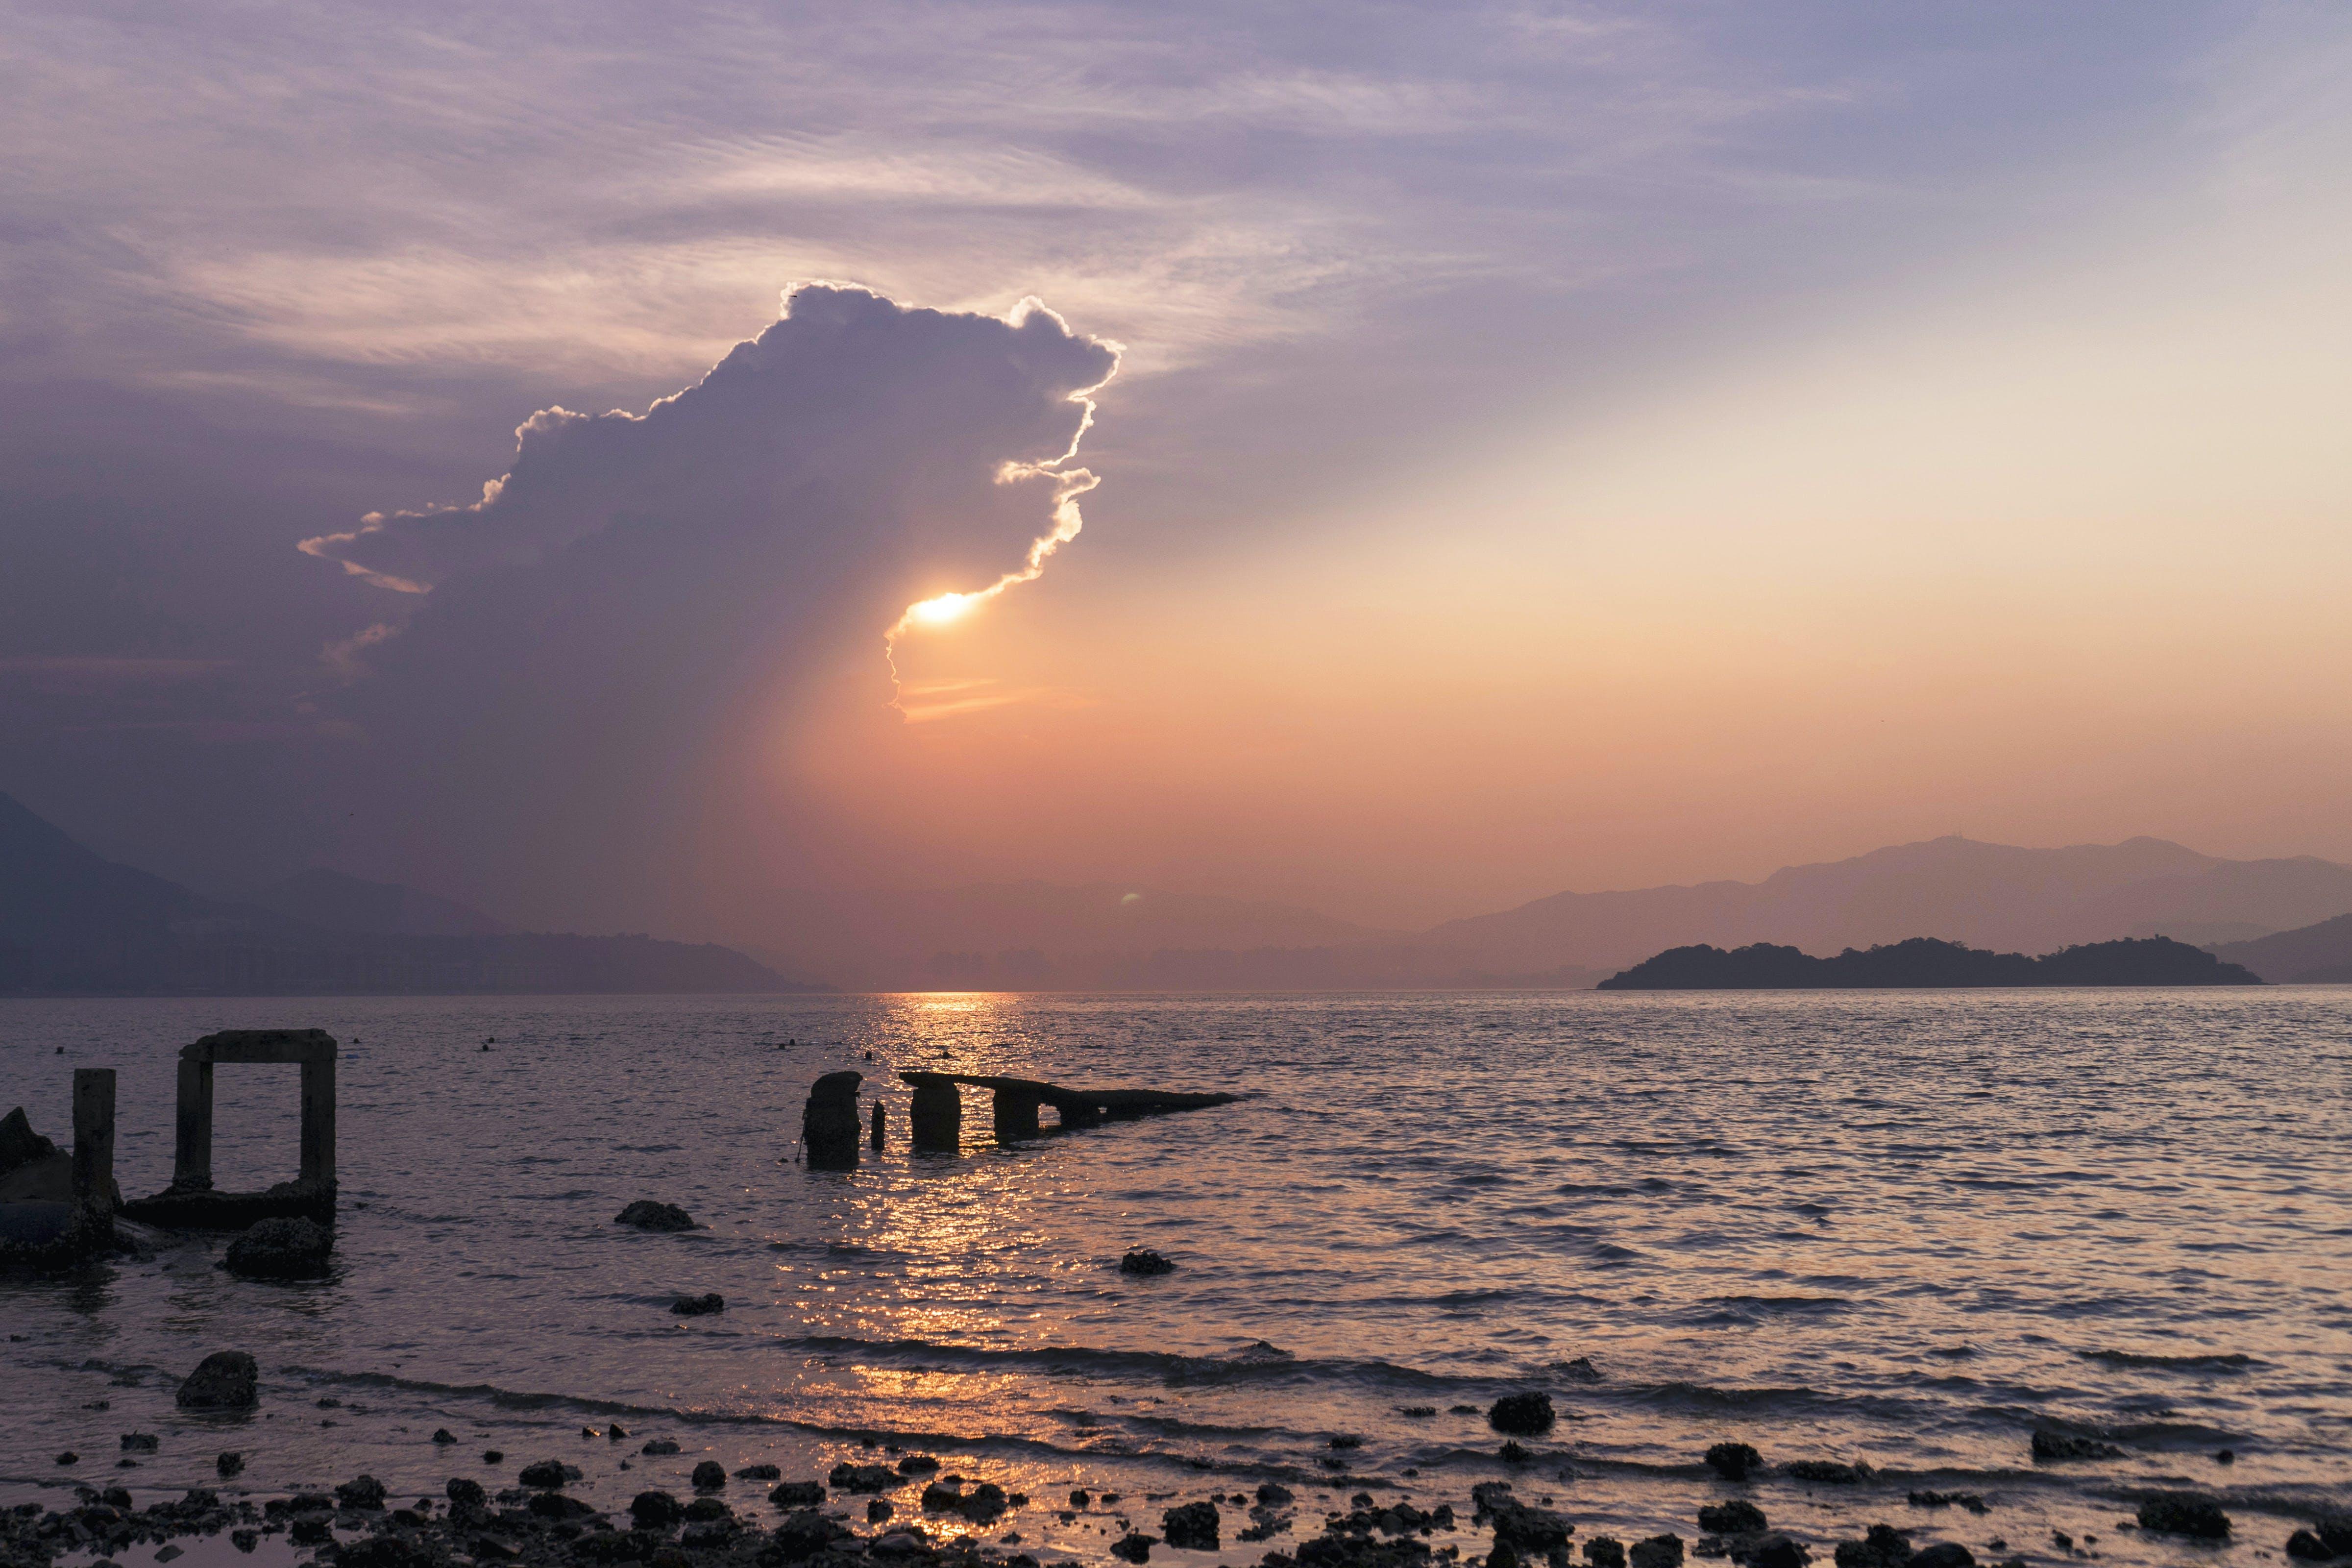 Seashore Under Cloudy Sky in Golden Hour Photography